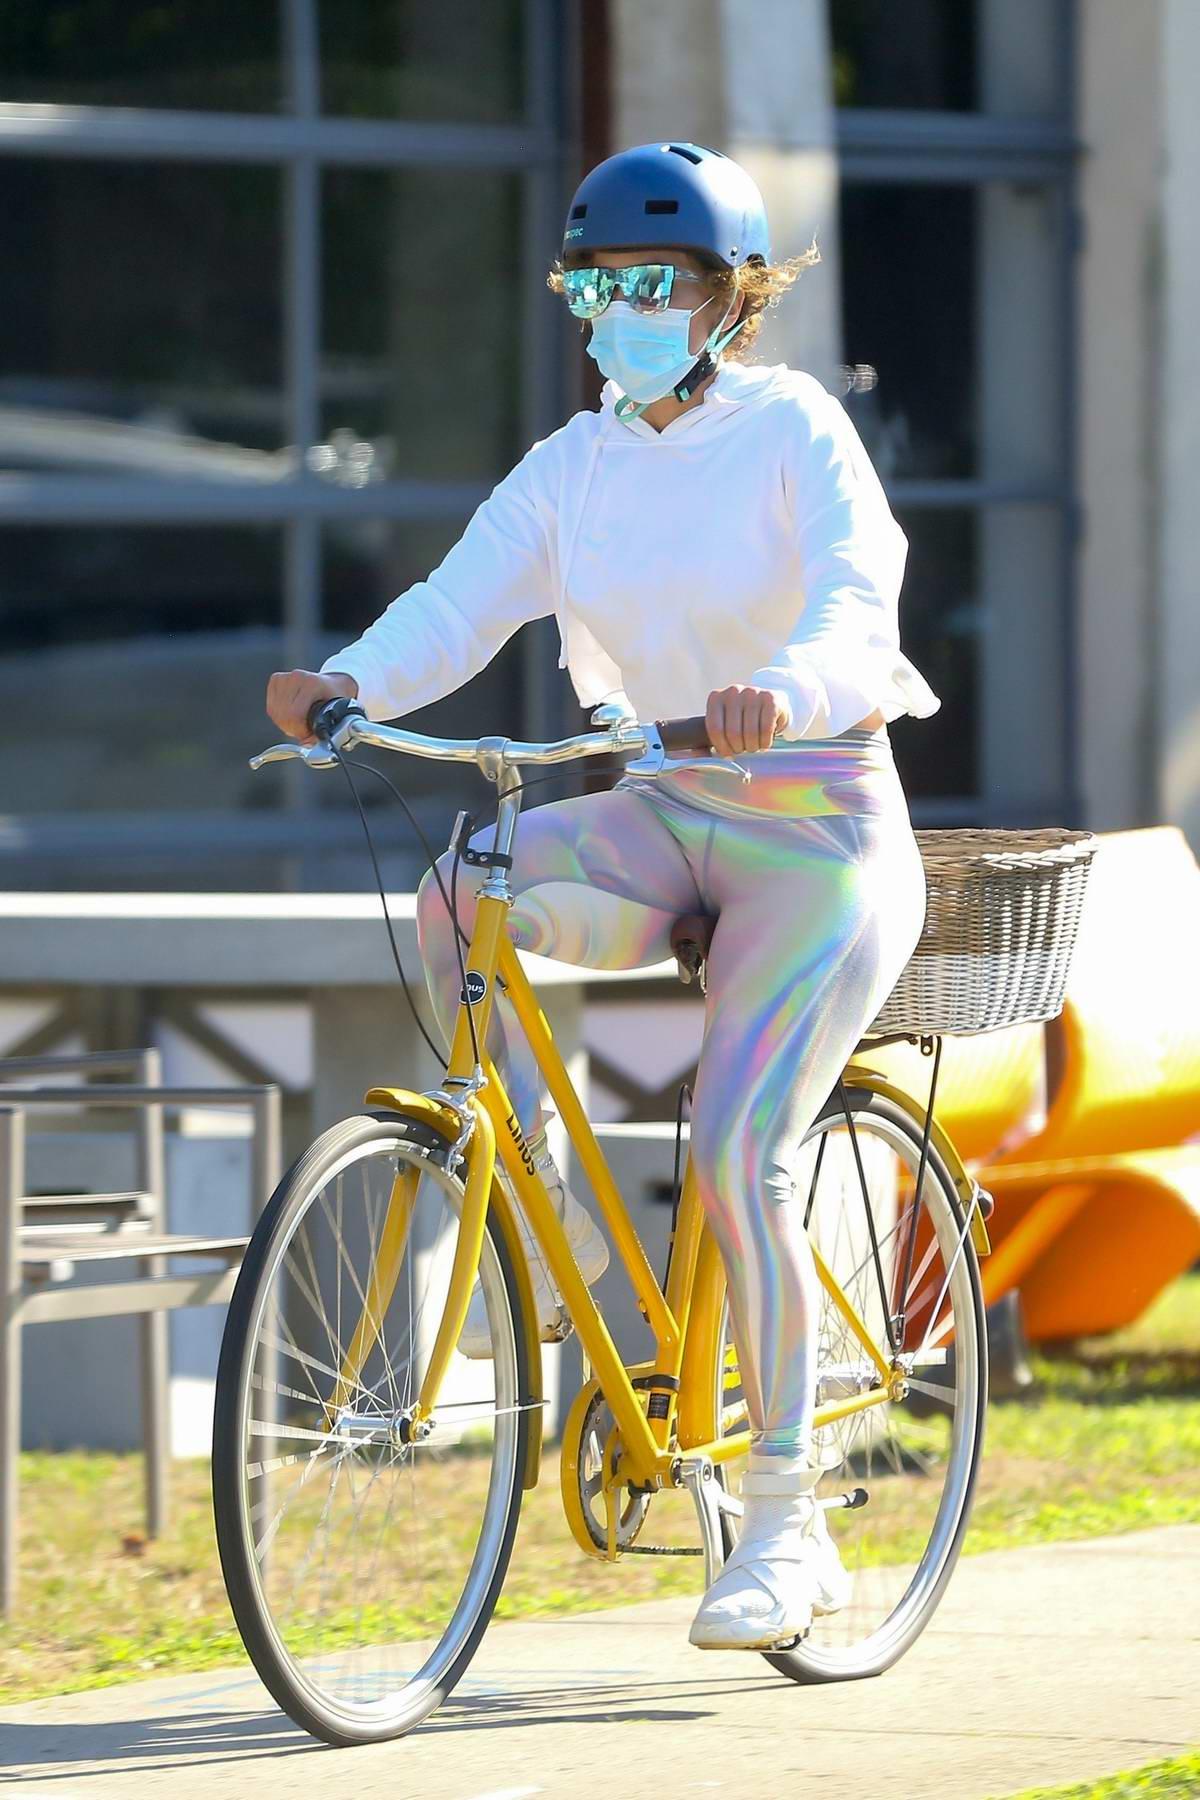 Jennifer Lopez sports a white hoodie and rainbow leggings while biking around the Hamptons, New York